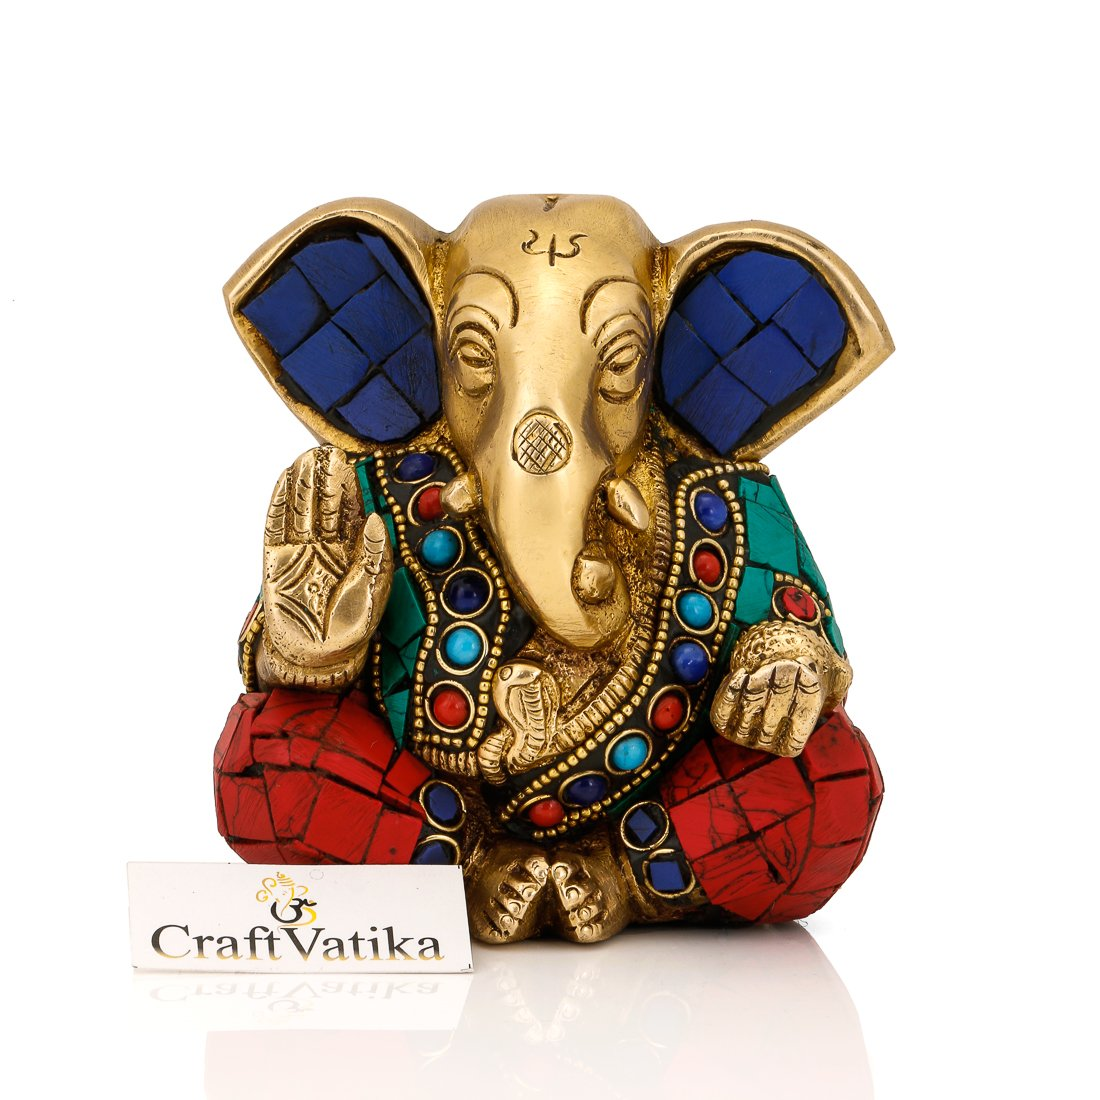 CraftVatika Ganesh Statue Hindu Lord Elephant God Turquoise Brass Sculpture Ganpati Idol Decor Gift